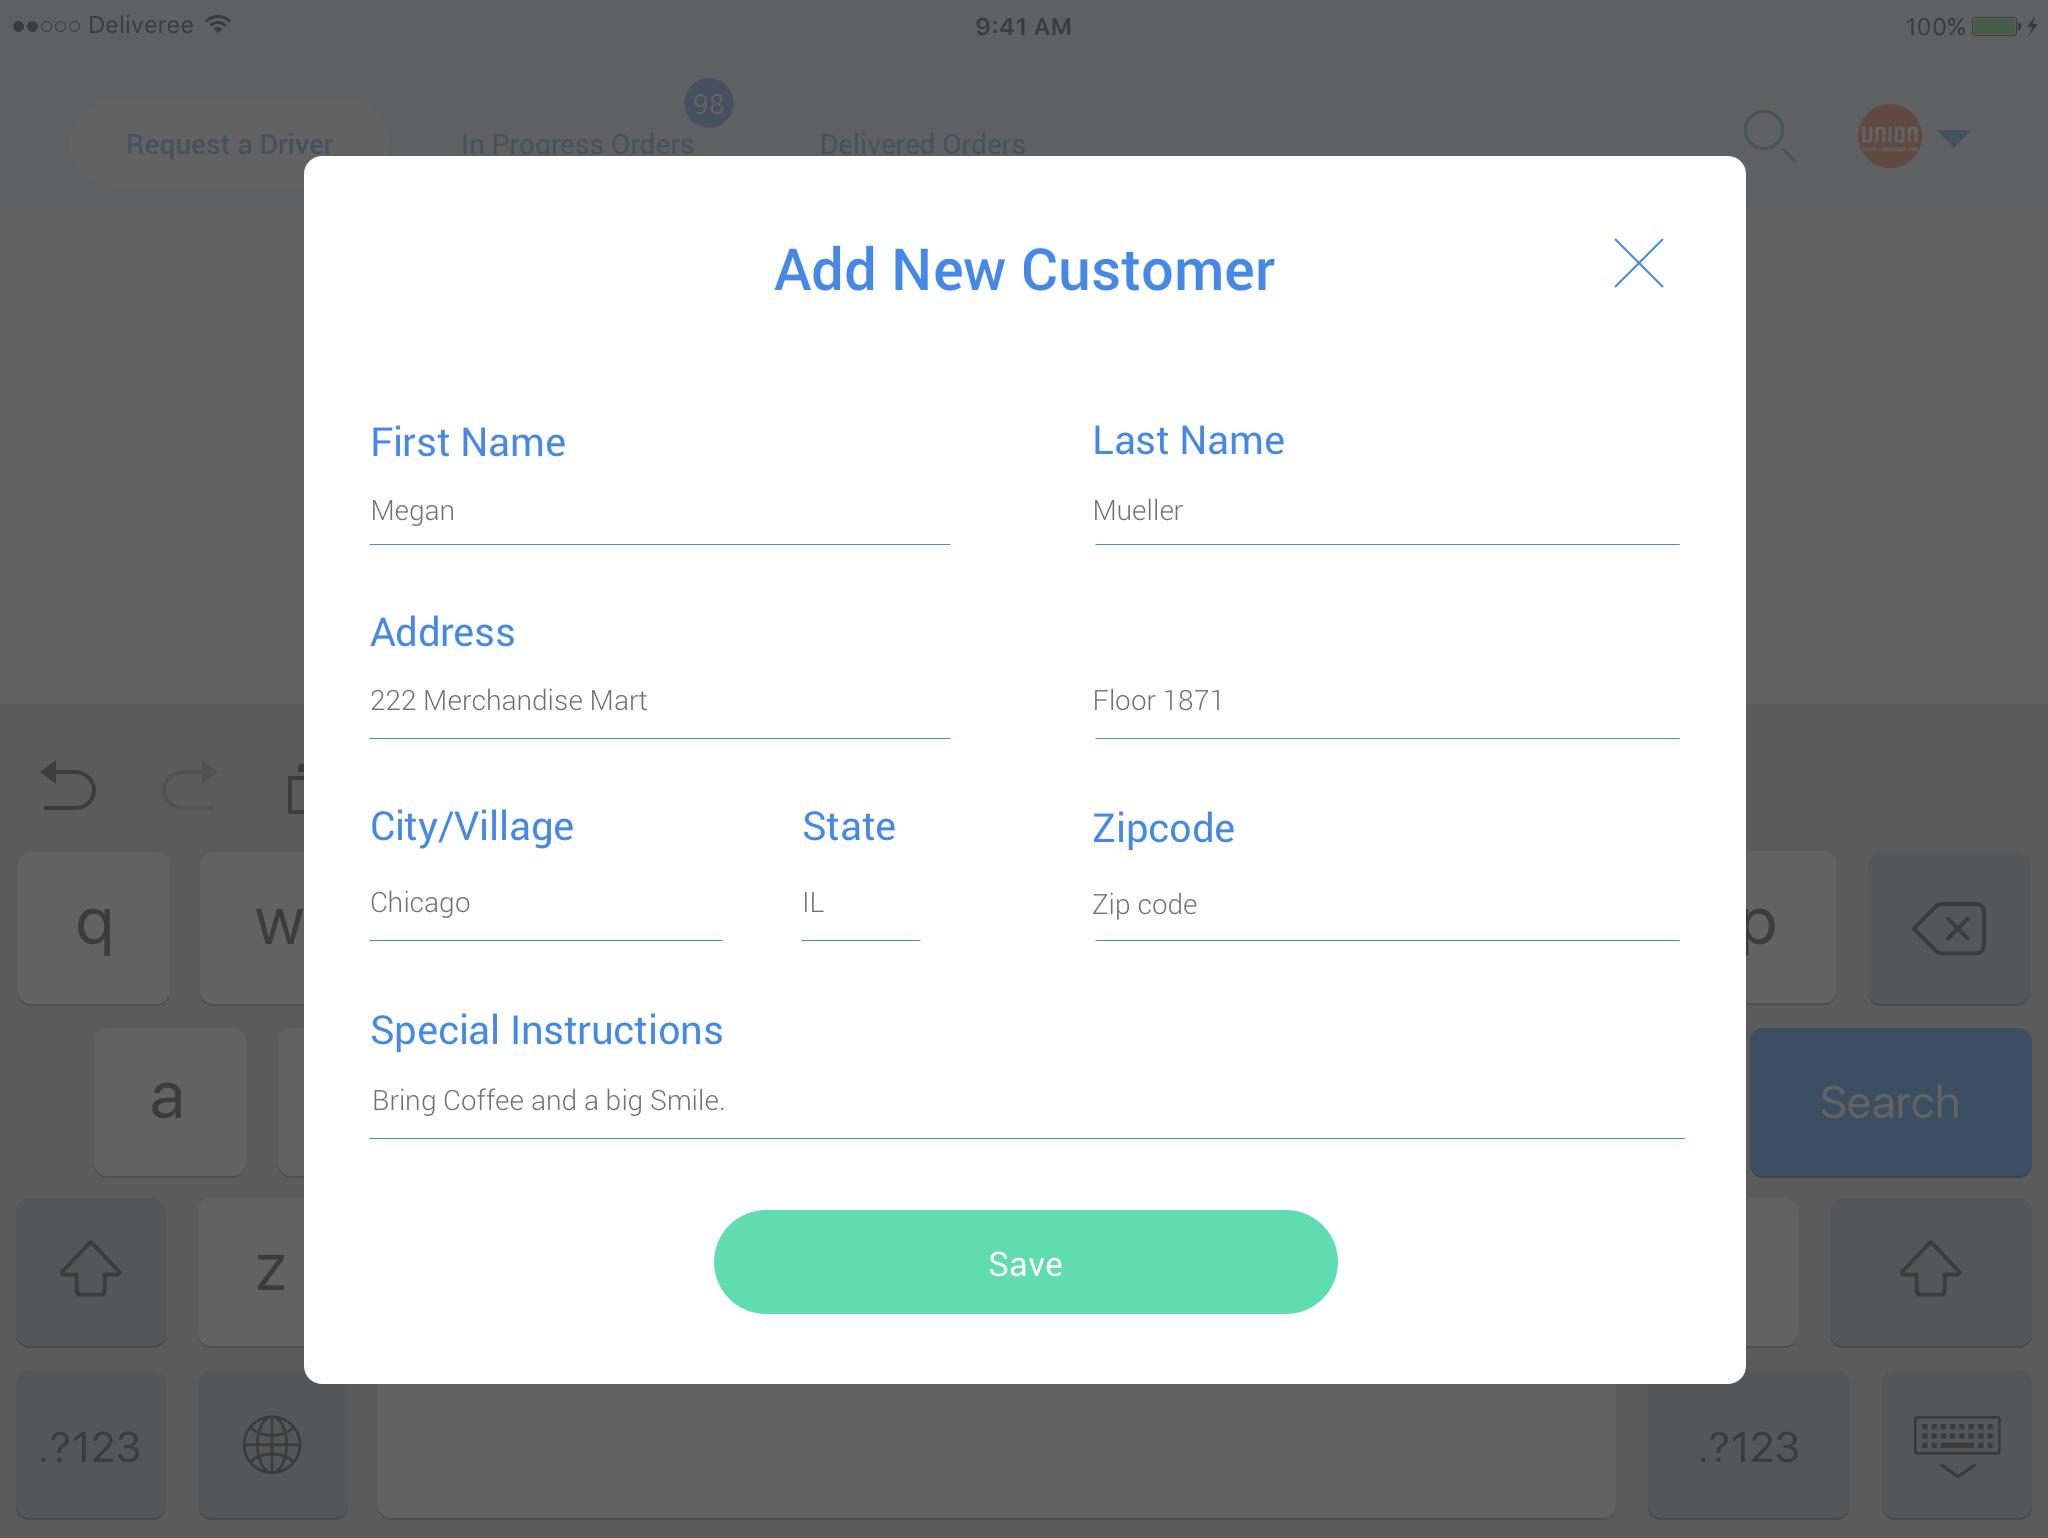 Add New Customer